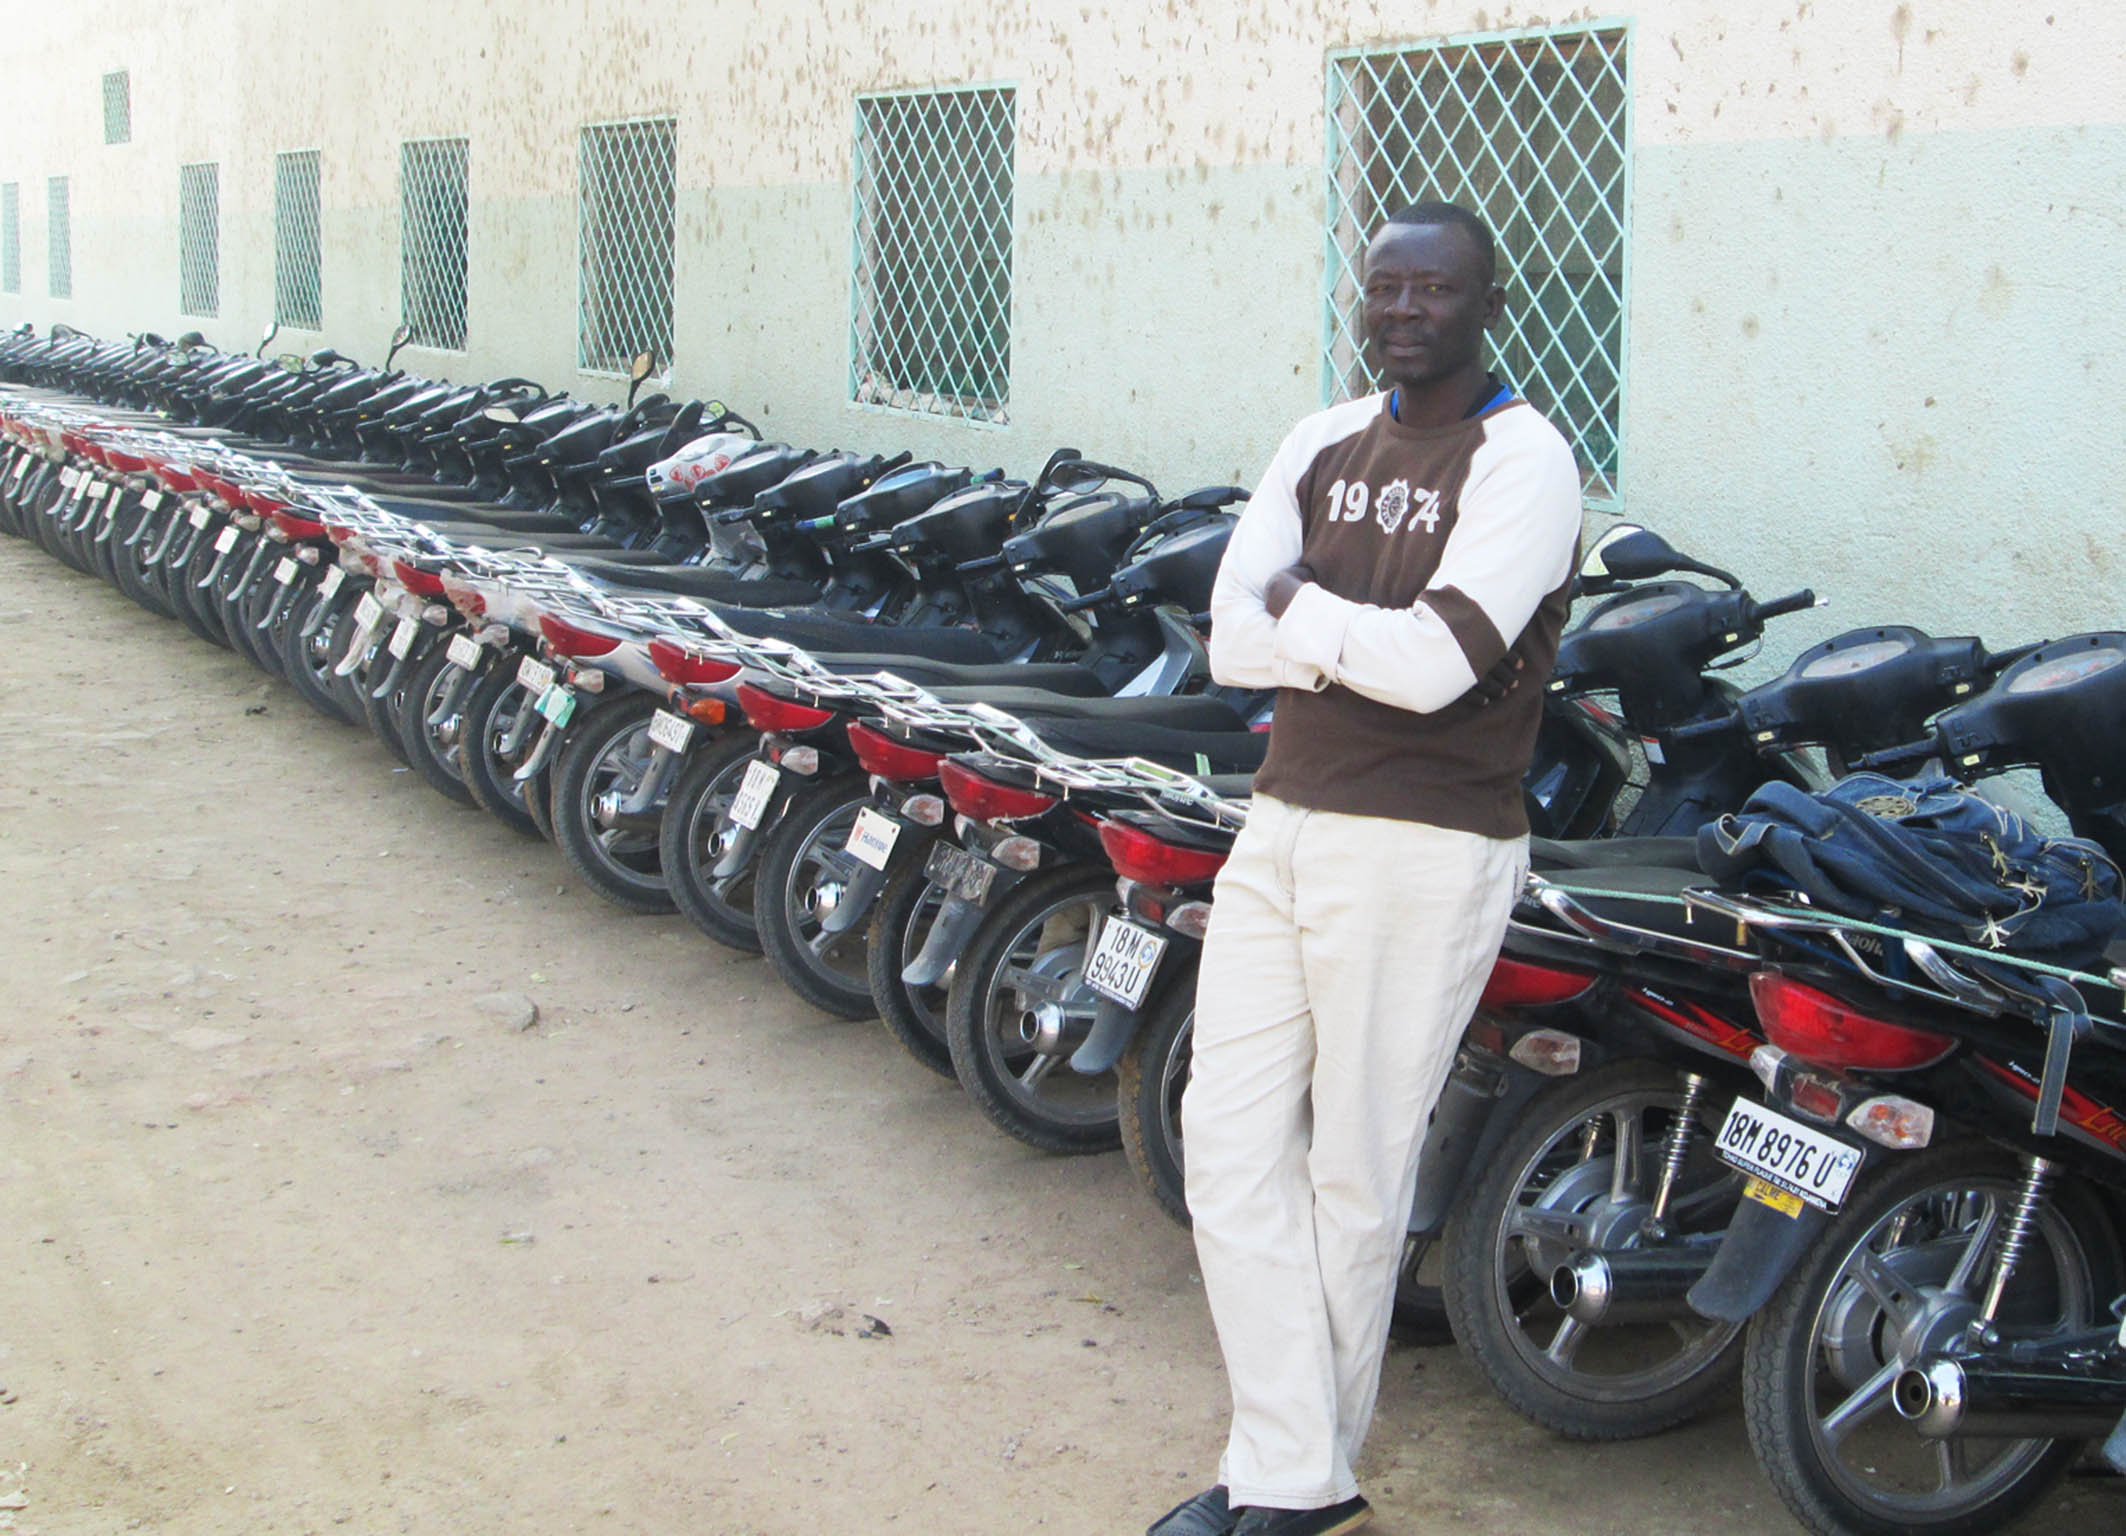 Ngu tobaye herv un dipl m sans emploi gardien des engins - Gardien d immeuble sans diplome ...